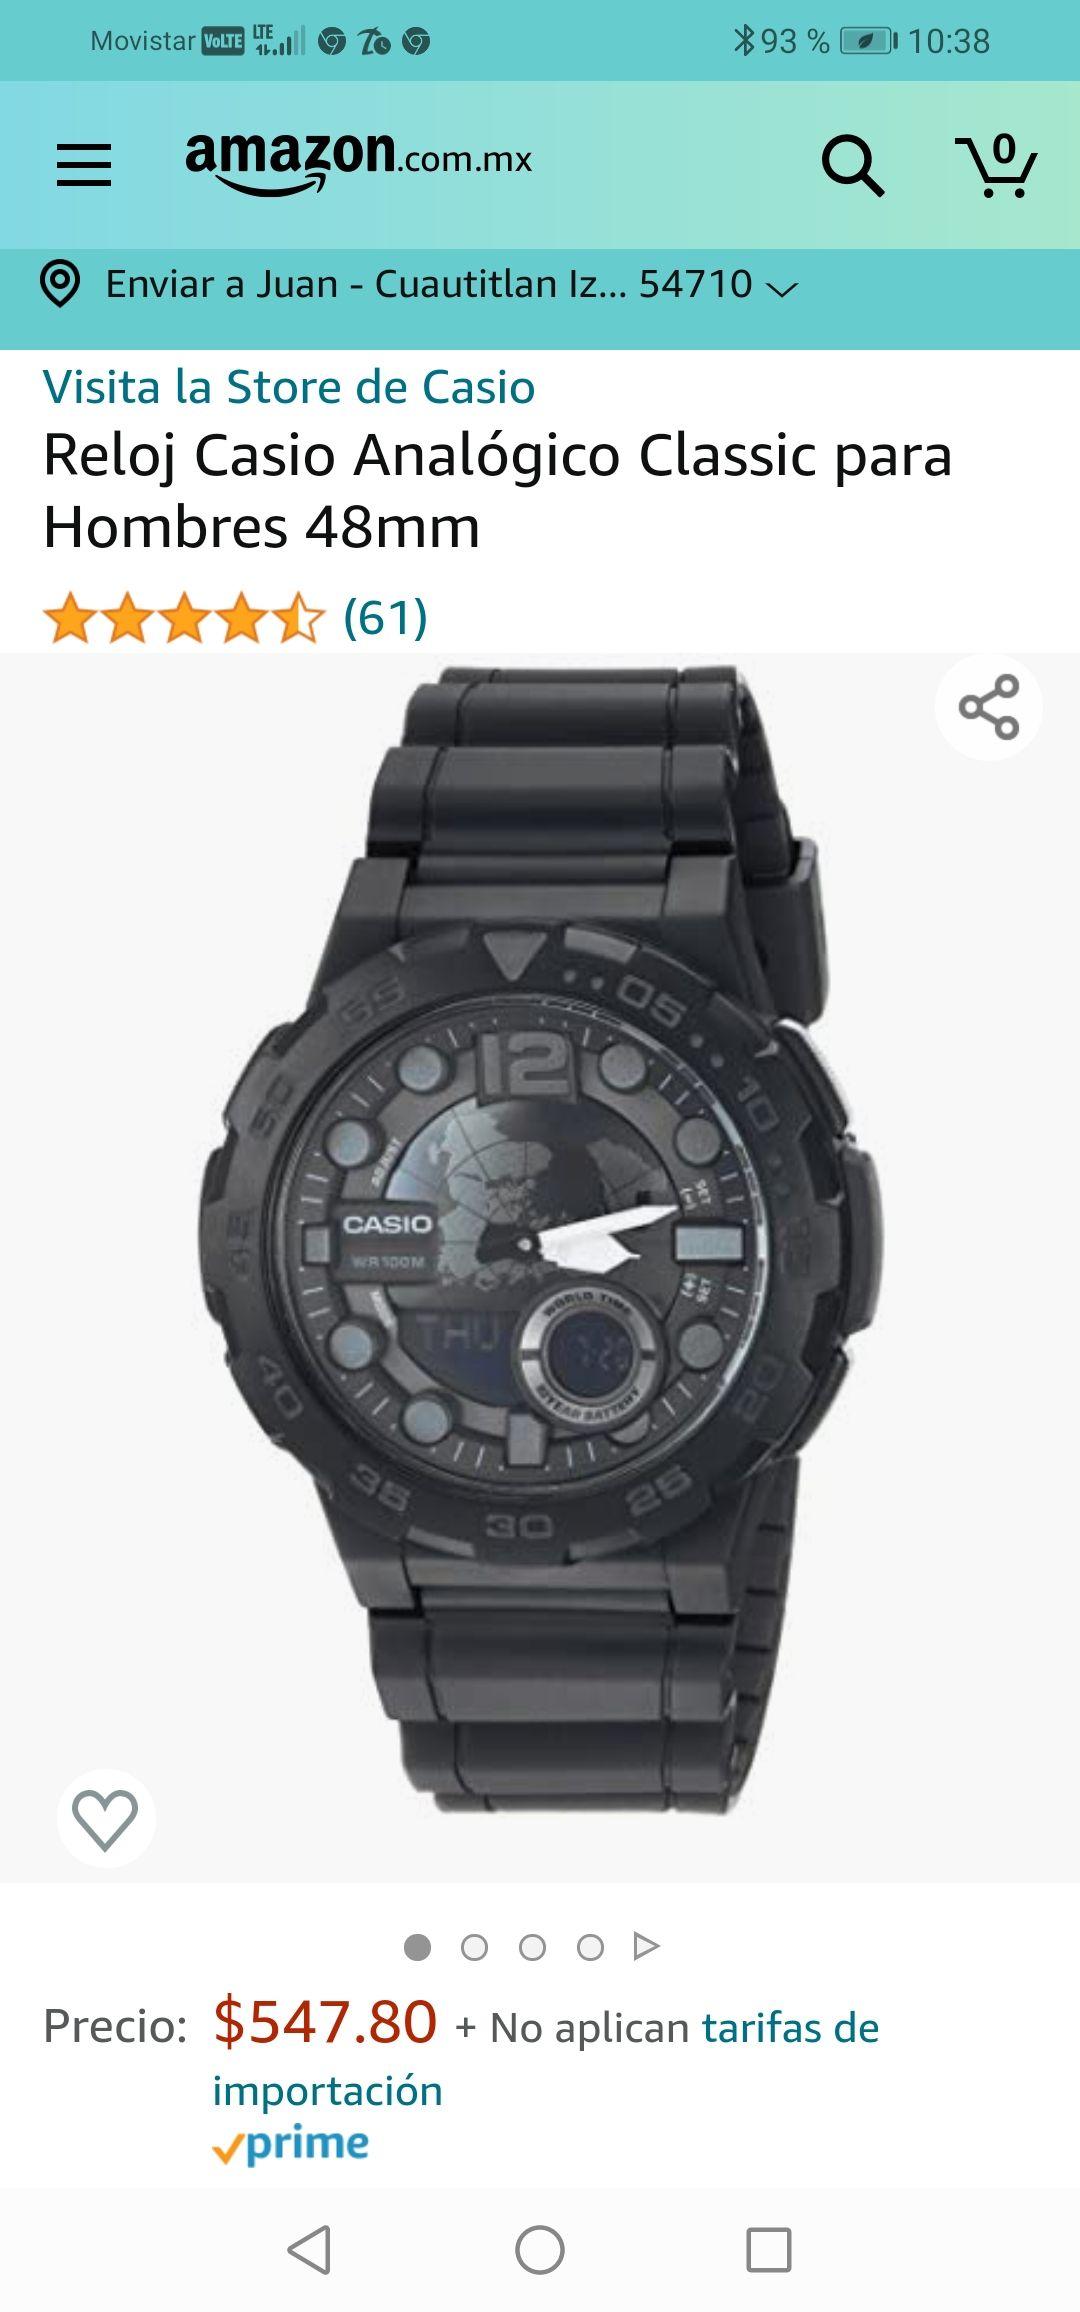 Amazon : Reloj Casio Analógico Classic para Hombres 48mm